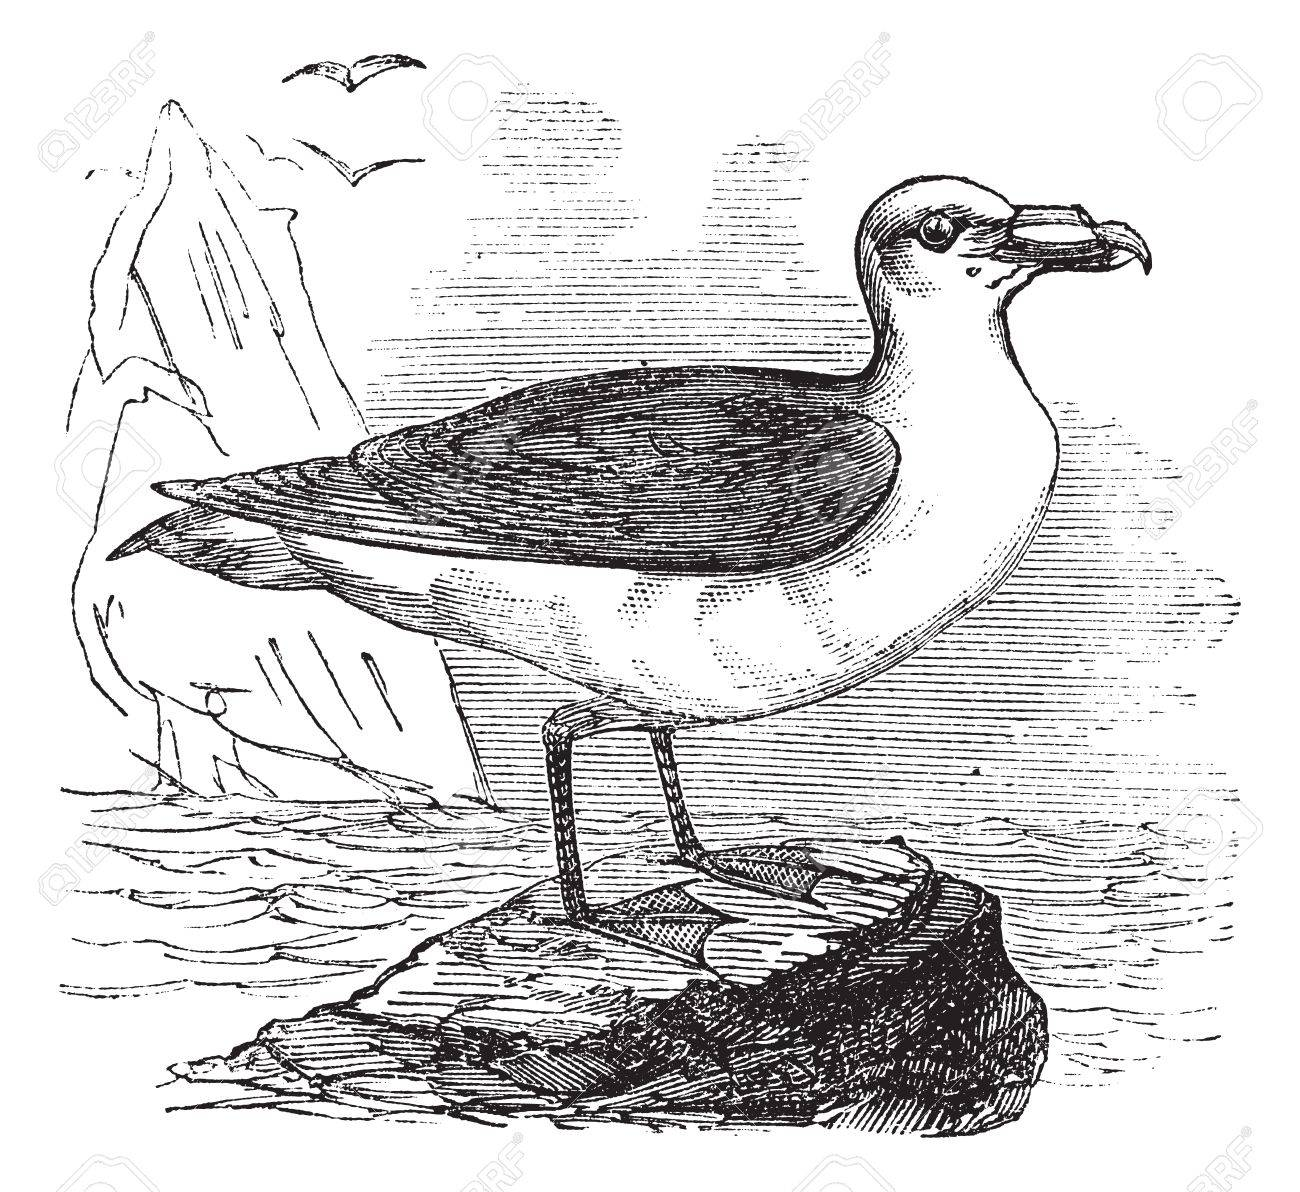 Grey Petrel or Brown Petrel or Pediunker or Grey Shearwater or Procellaria cinerea, vintage engraved illustration. Trousset encyclopedia (1886 - 1891). Stock Vector - 13770801